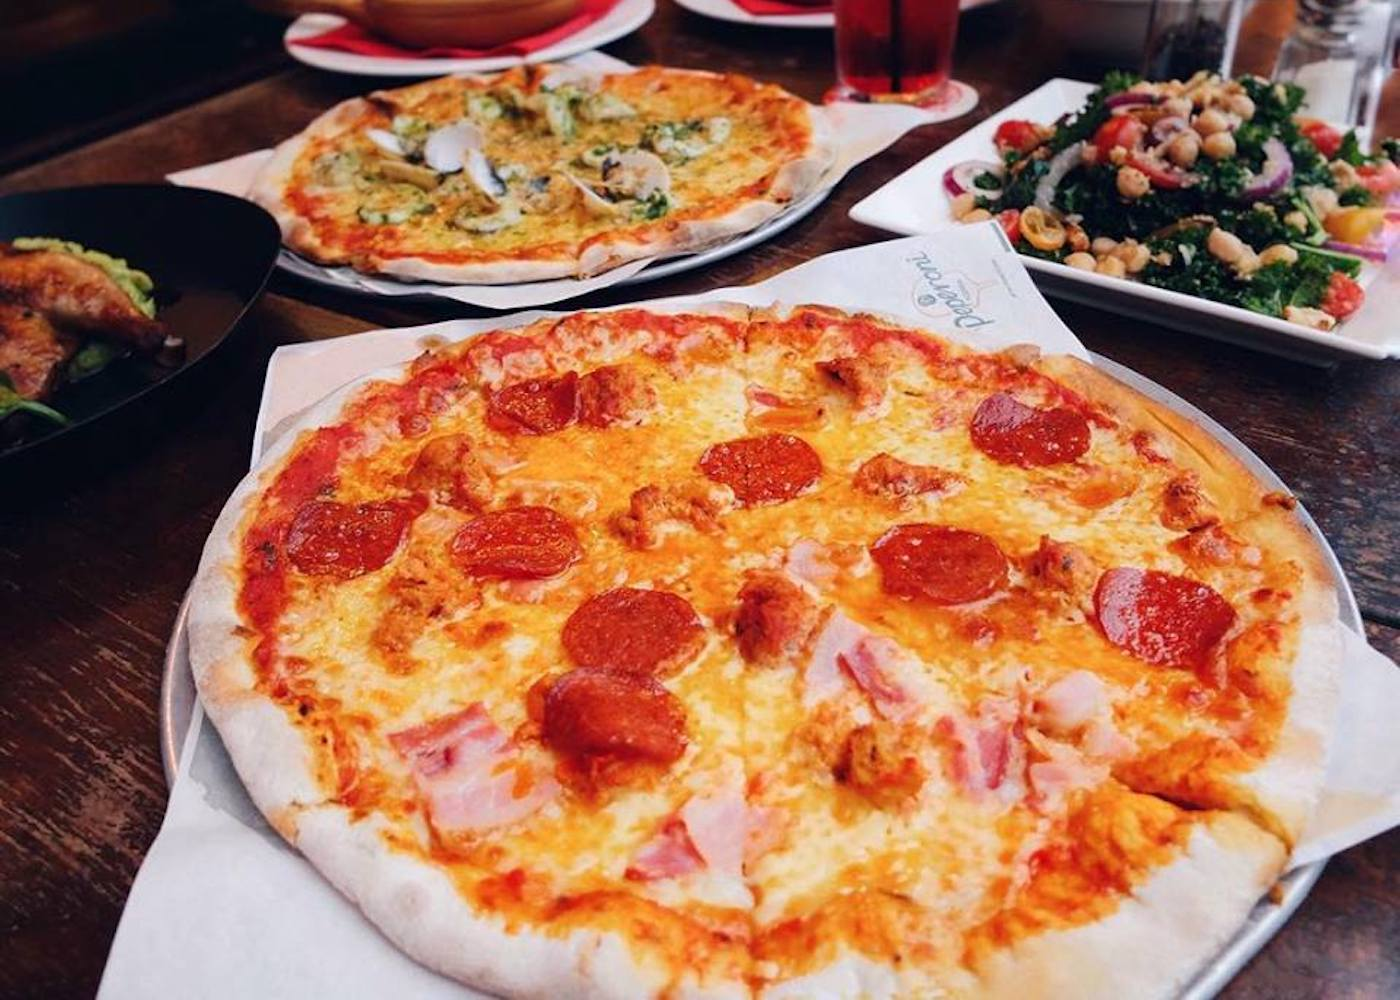 Family friendly pizza in Singapore: Peperoni Pizzeria